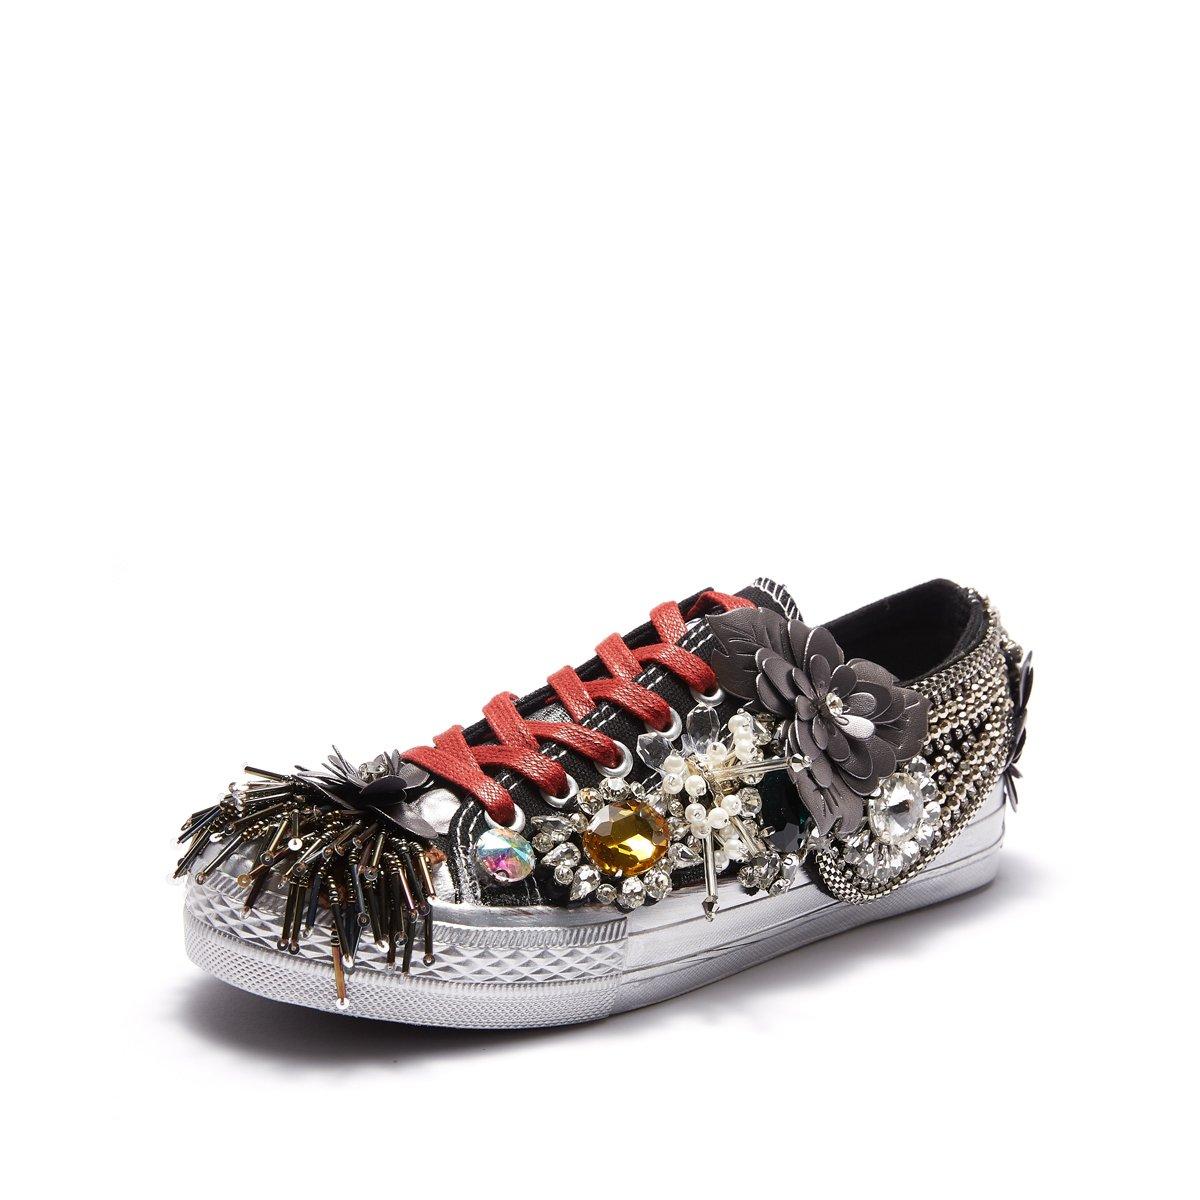 NBWE Femmes Rivets Hip-hop Rue Décoration personnalité Chaussures Chaussures Rivets Strass NBWE Gland Métal Décoration Chaussures Basses Black 55d1d7a - conorscully.space